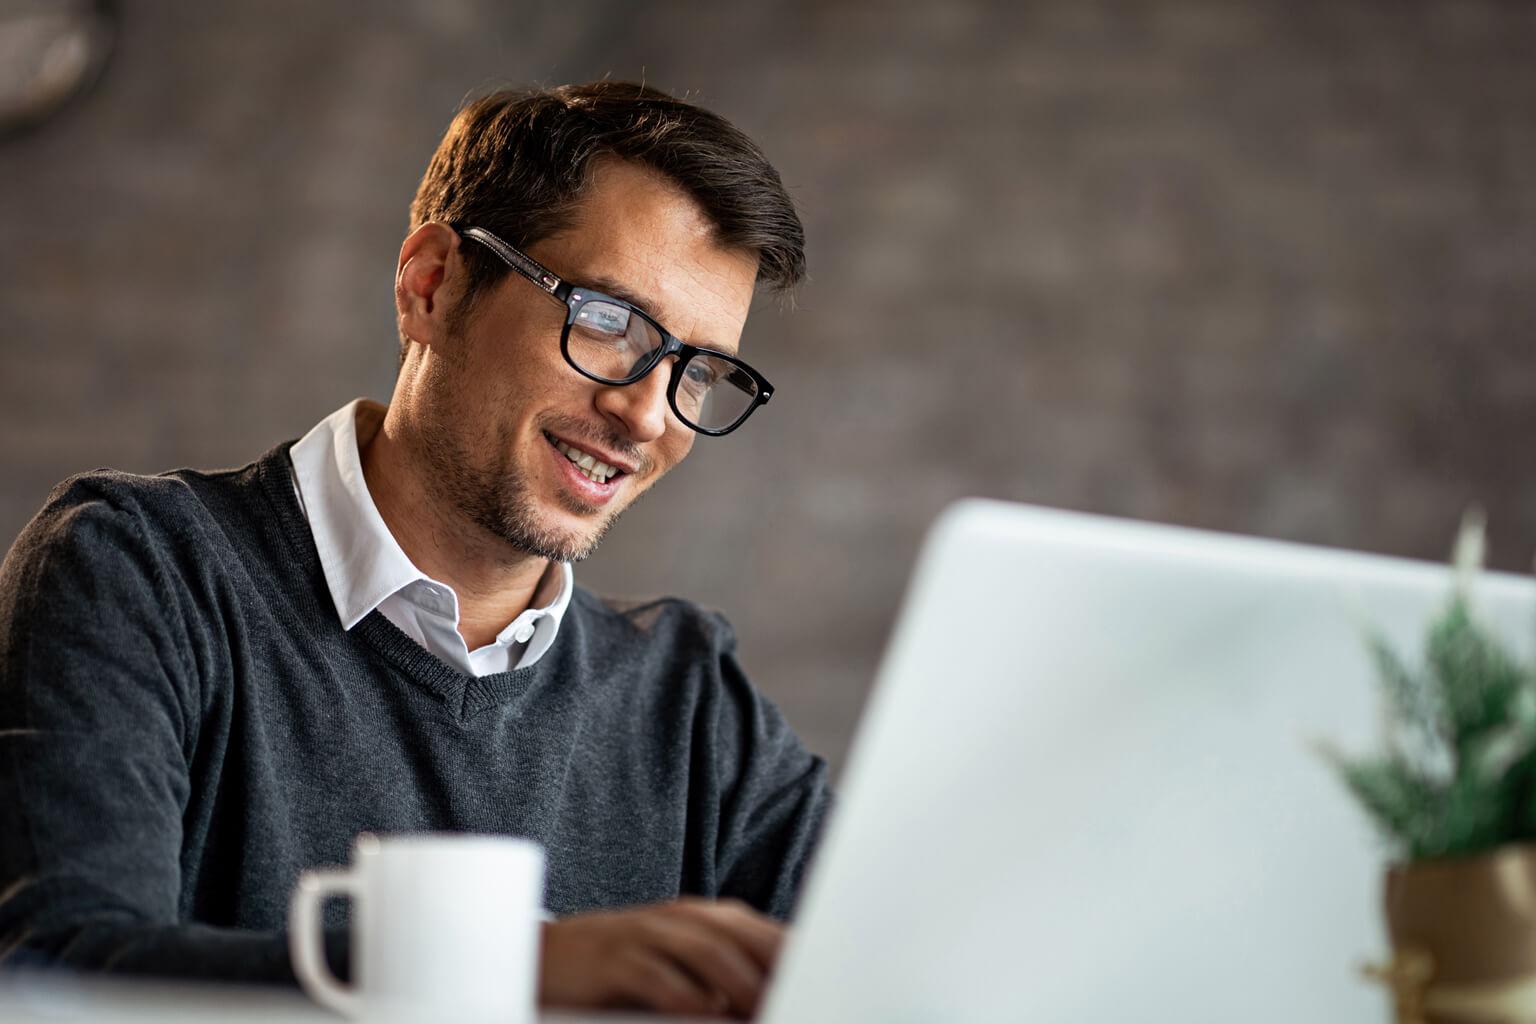 Caucasian man on laptop